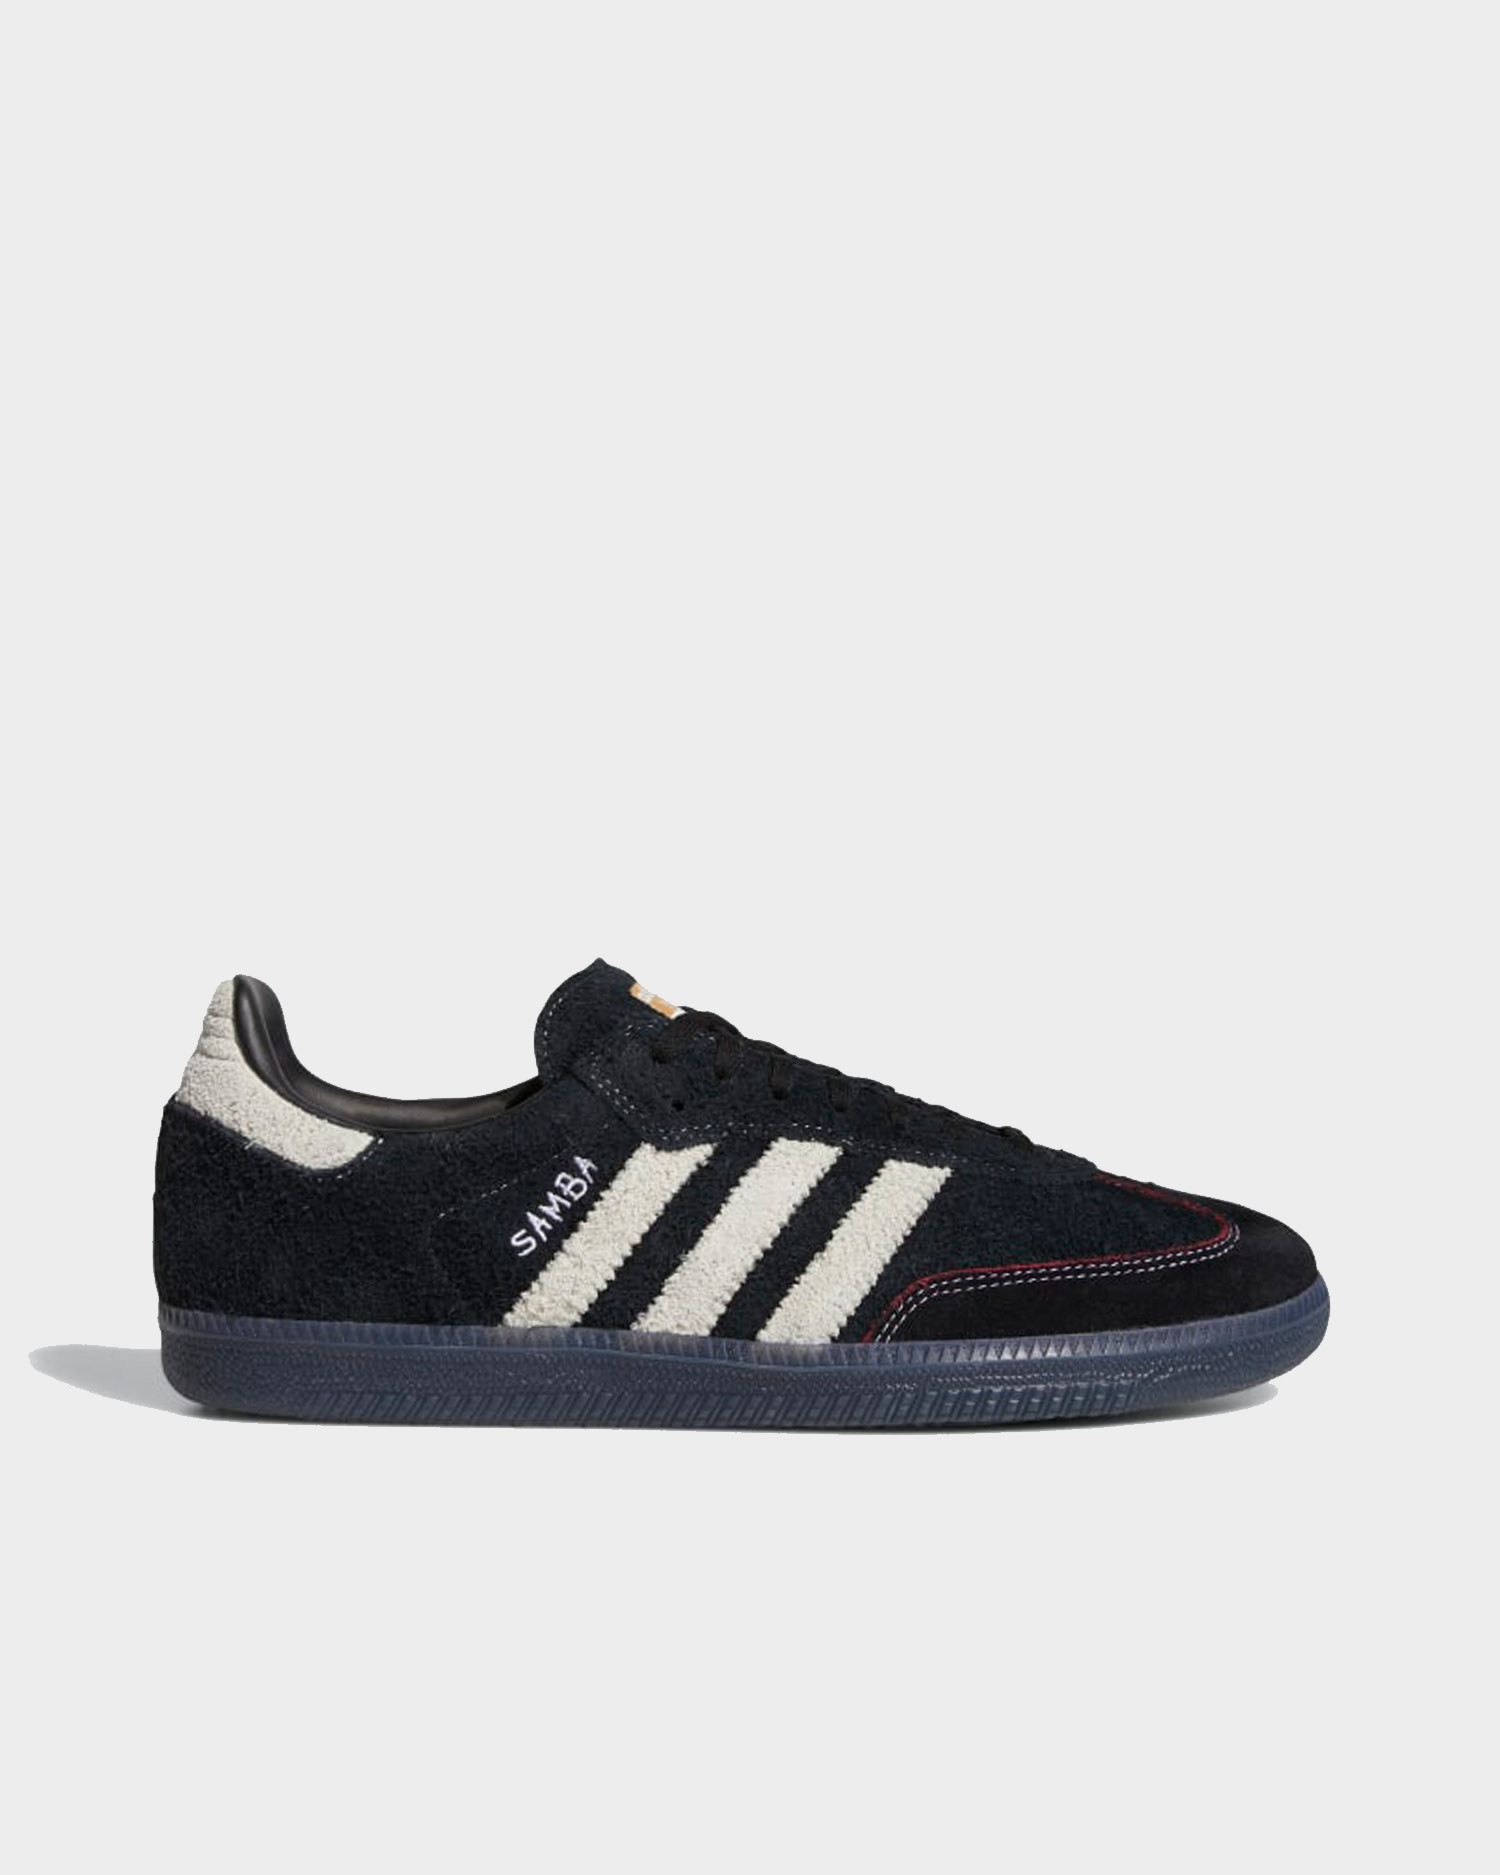 Adidas Maité Samba ADV Cblack/Ftwwh